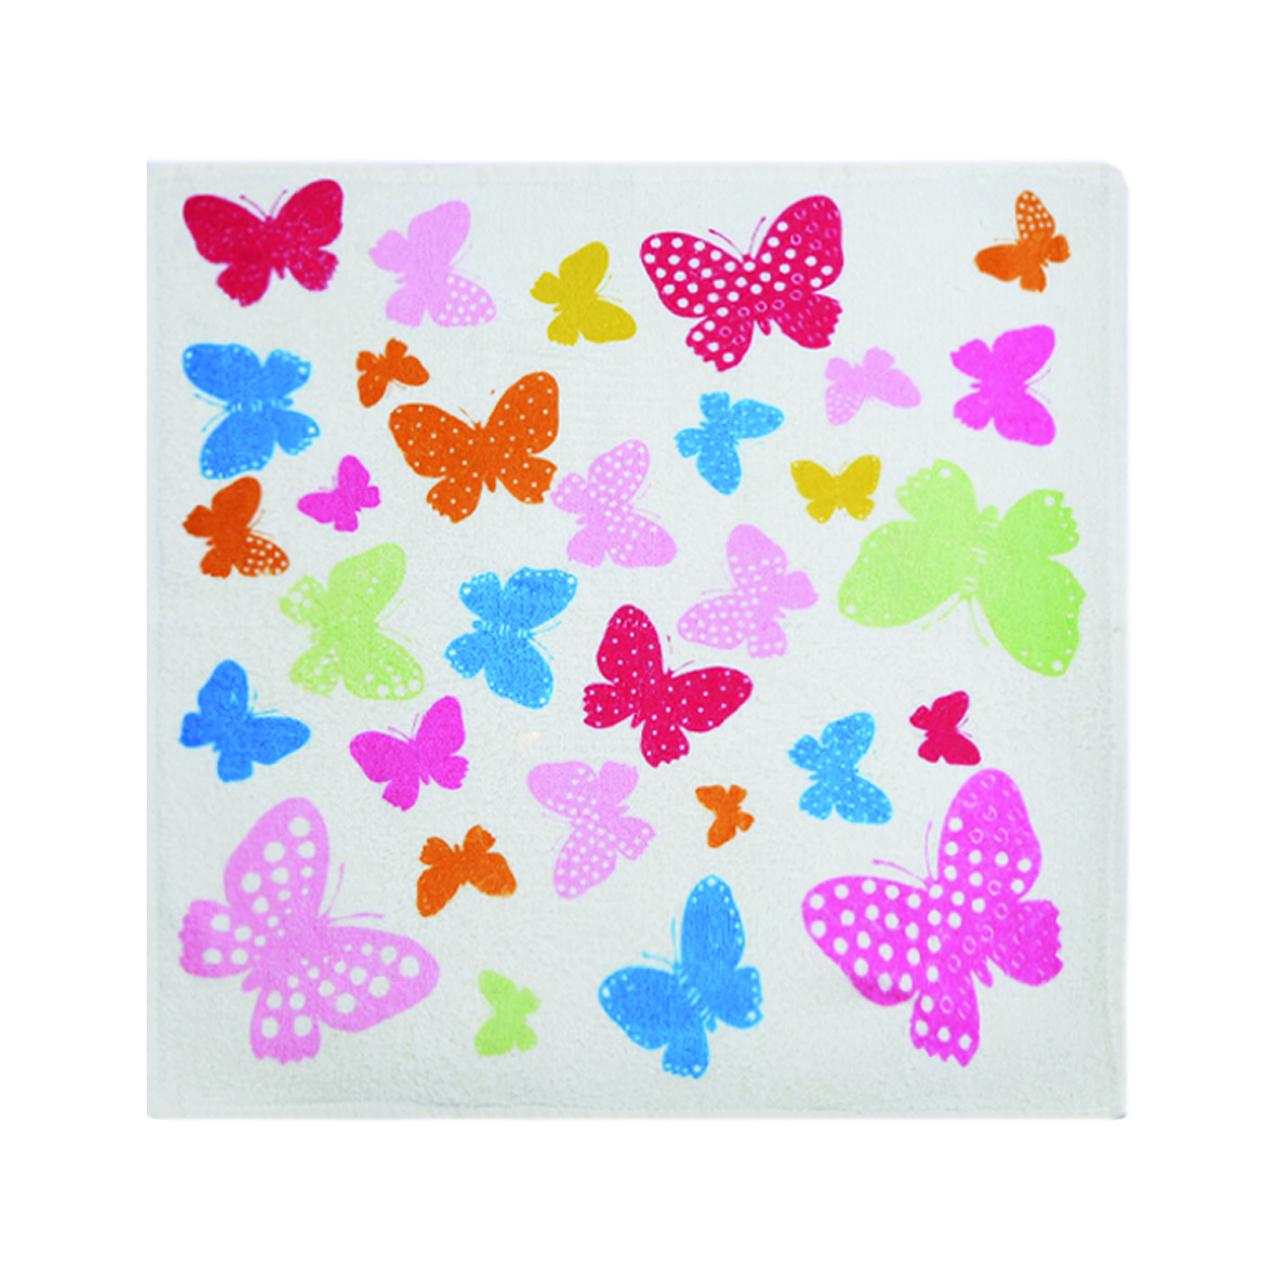 حوله آشپزخانه آکیپک مدل Butterflies سایز 50x50 سانتیمتر